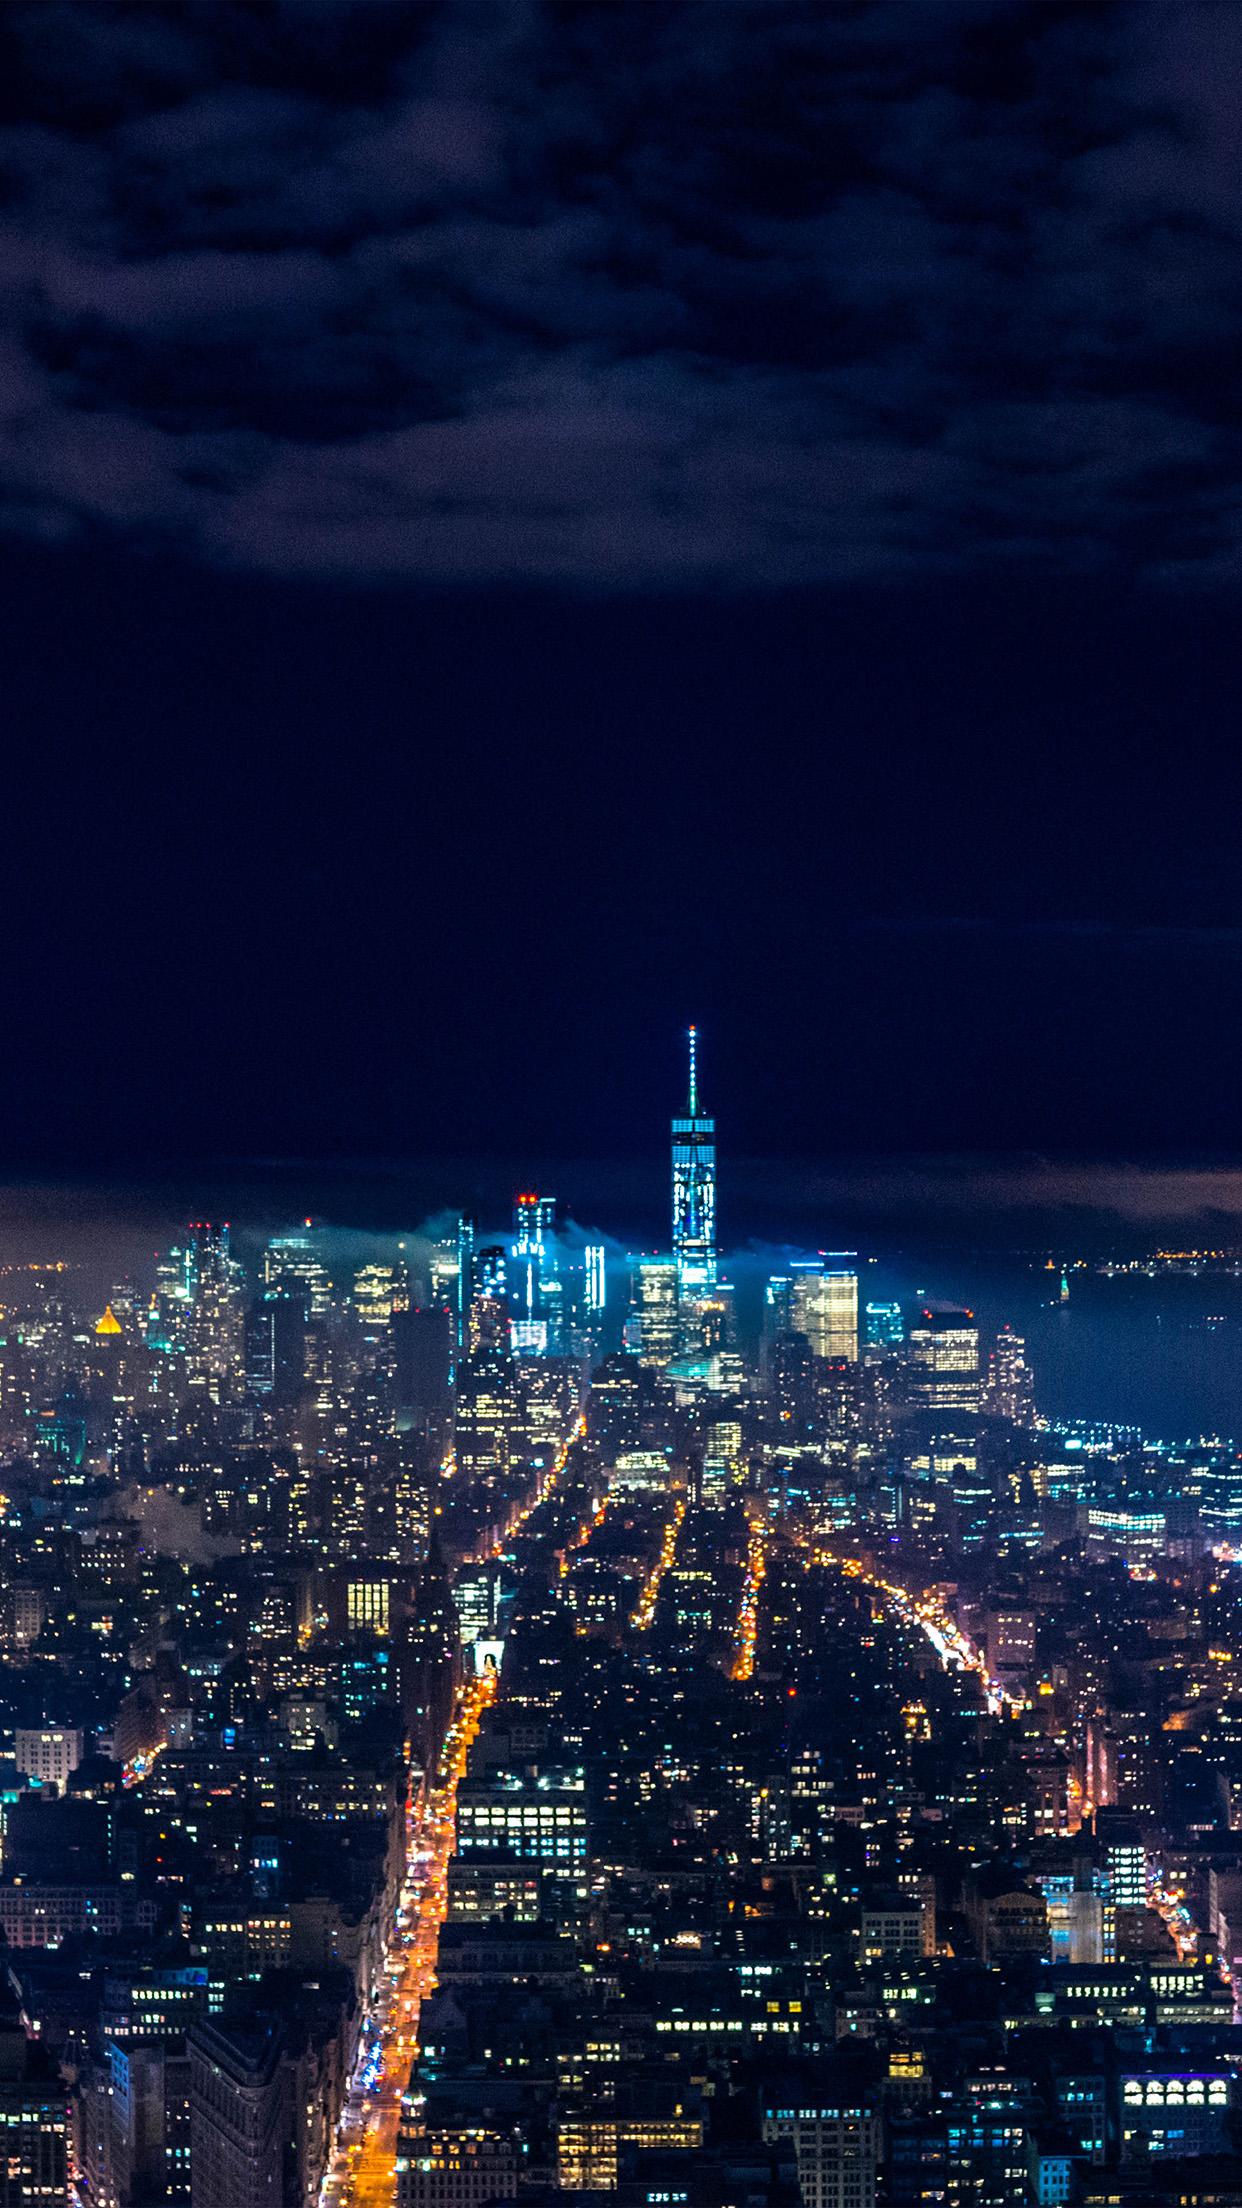 iphonepapers | iphone wallpaper | nx53-city-night-skyline-dark